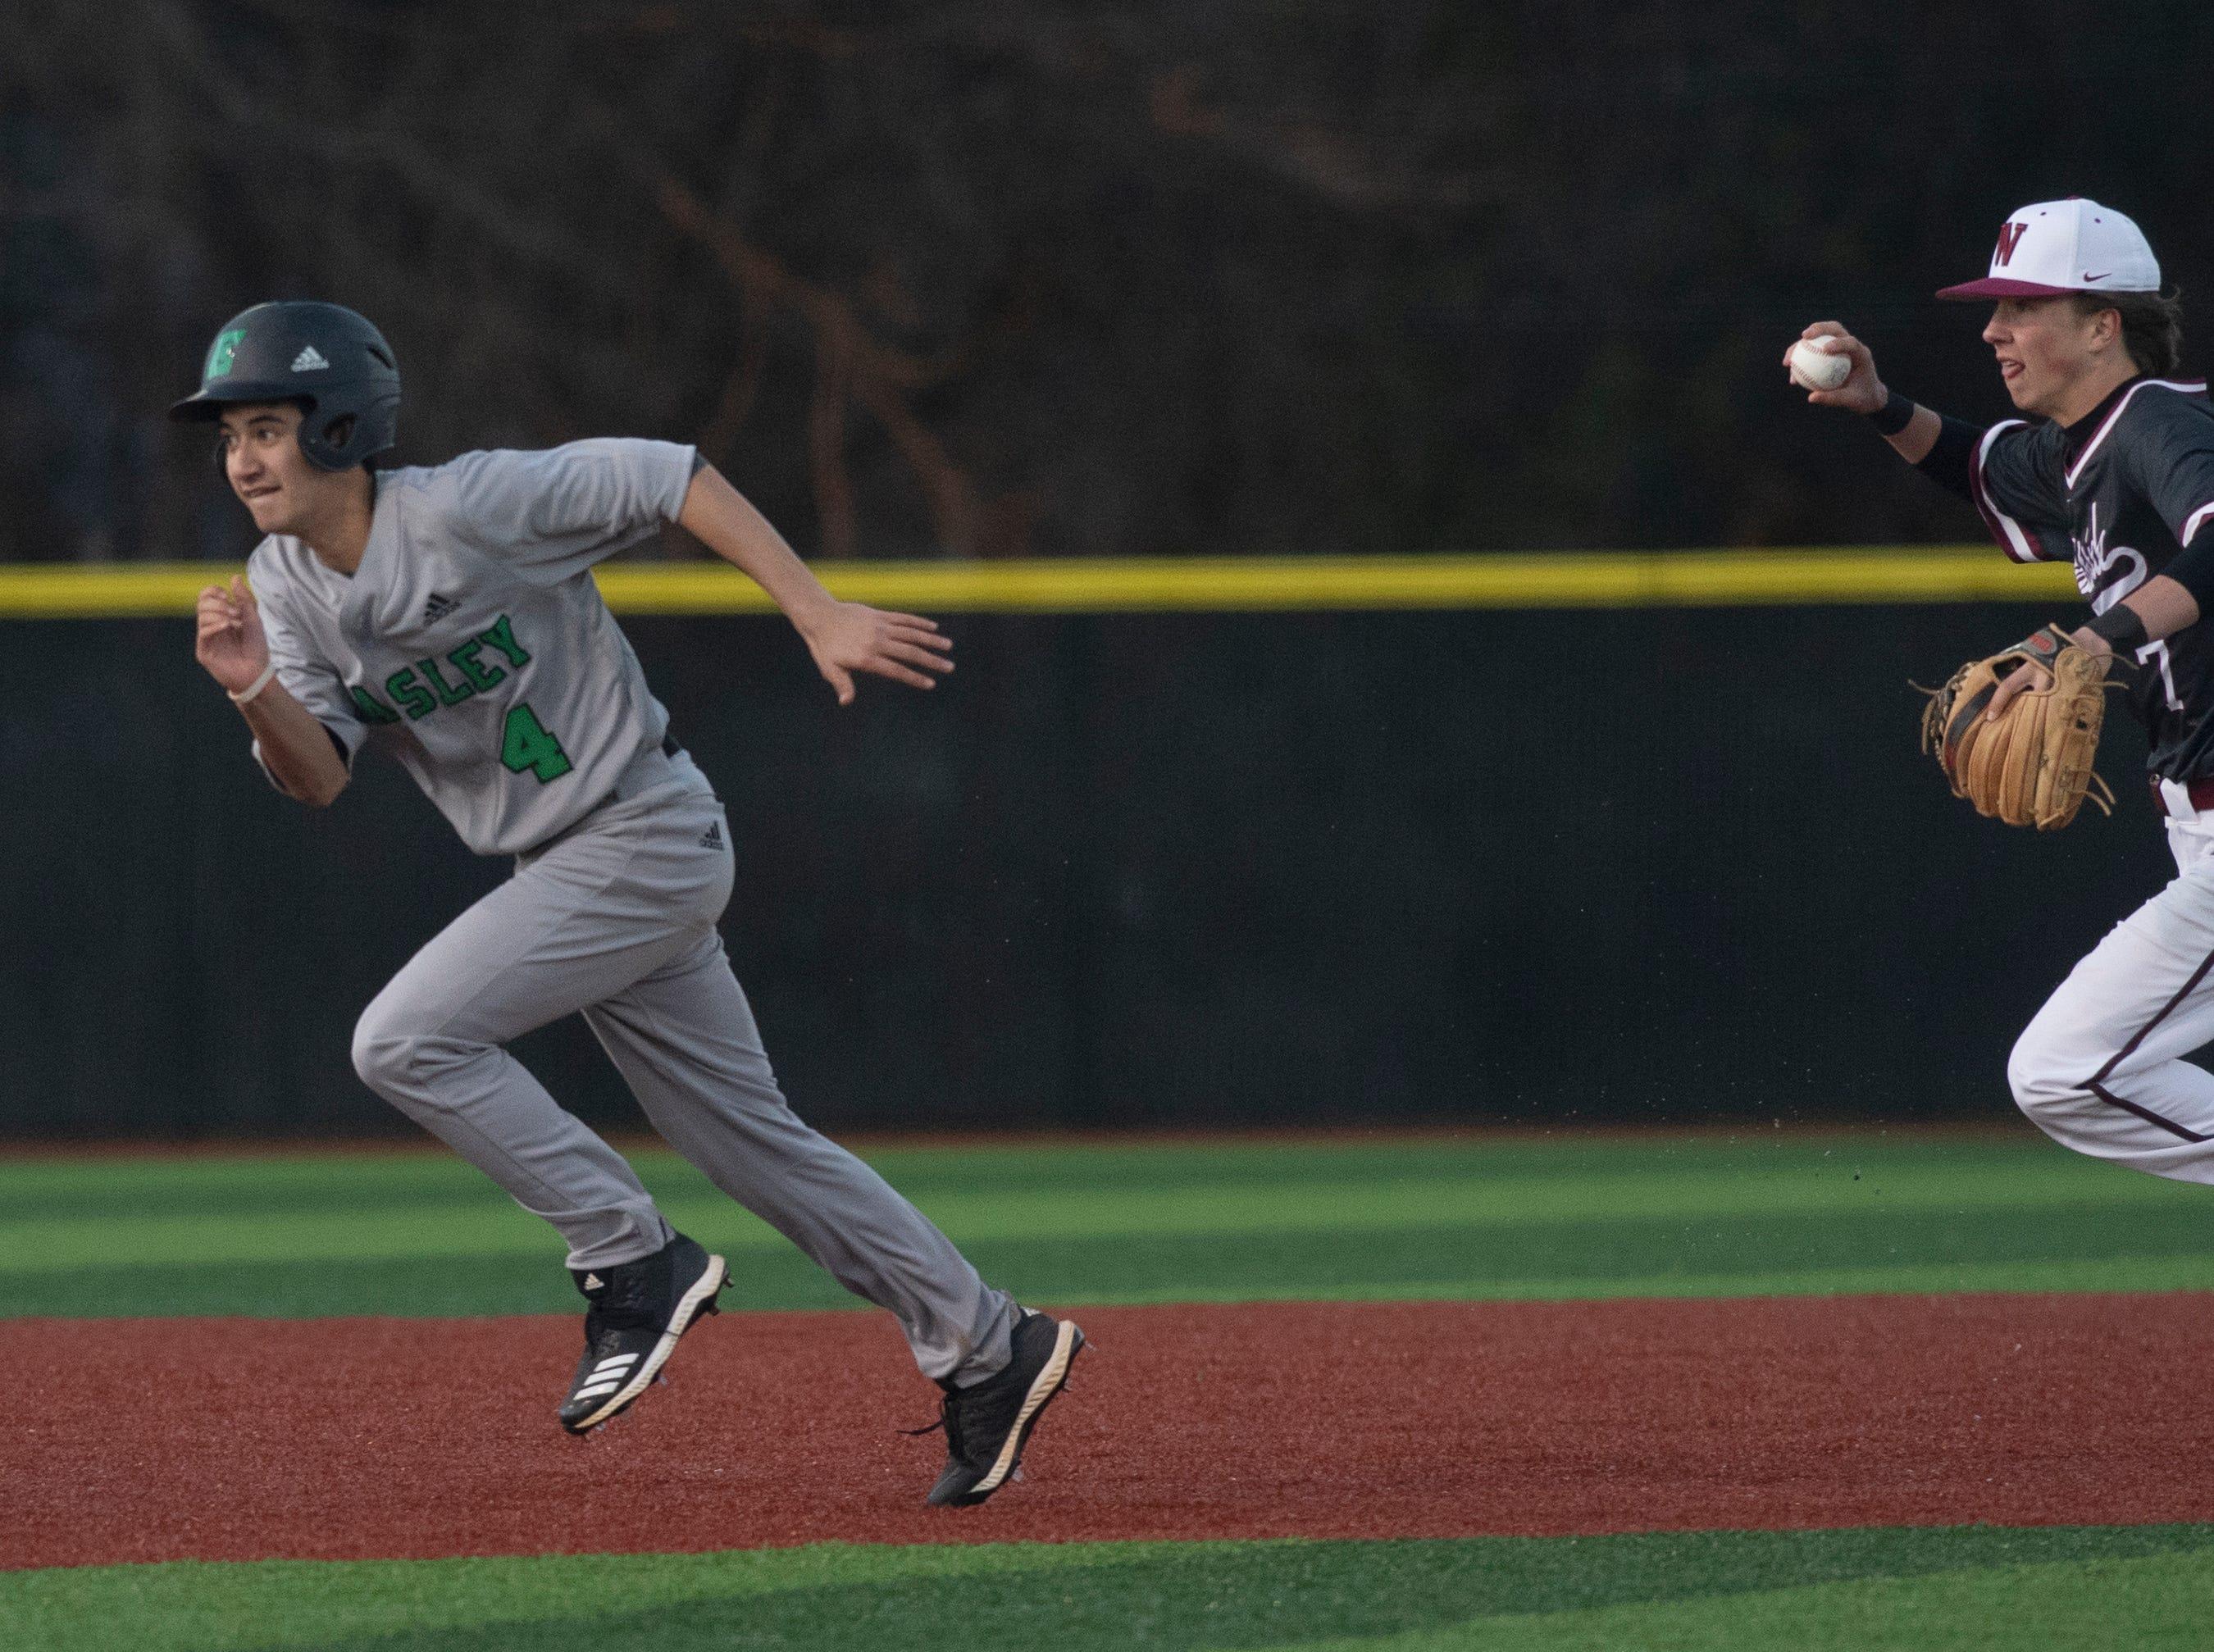 Westside High School's Cade Langston (7) chases Easley High School's Logan Mackey (4) before Mackey is tagged by Westside High School's Jaden Cribb (9) during the game  at Westside High School Tuesday, Mar. 5, 2019.